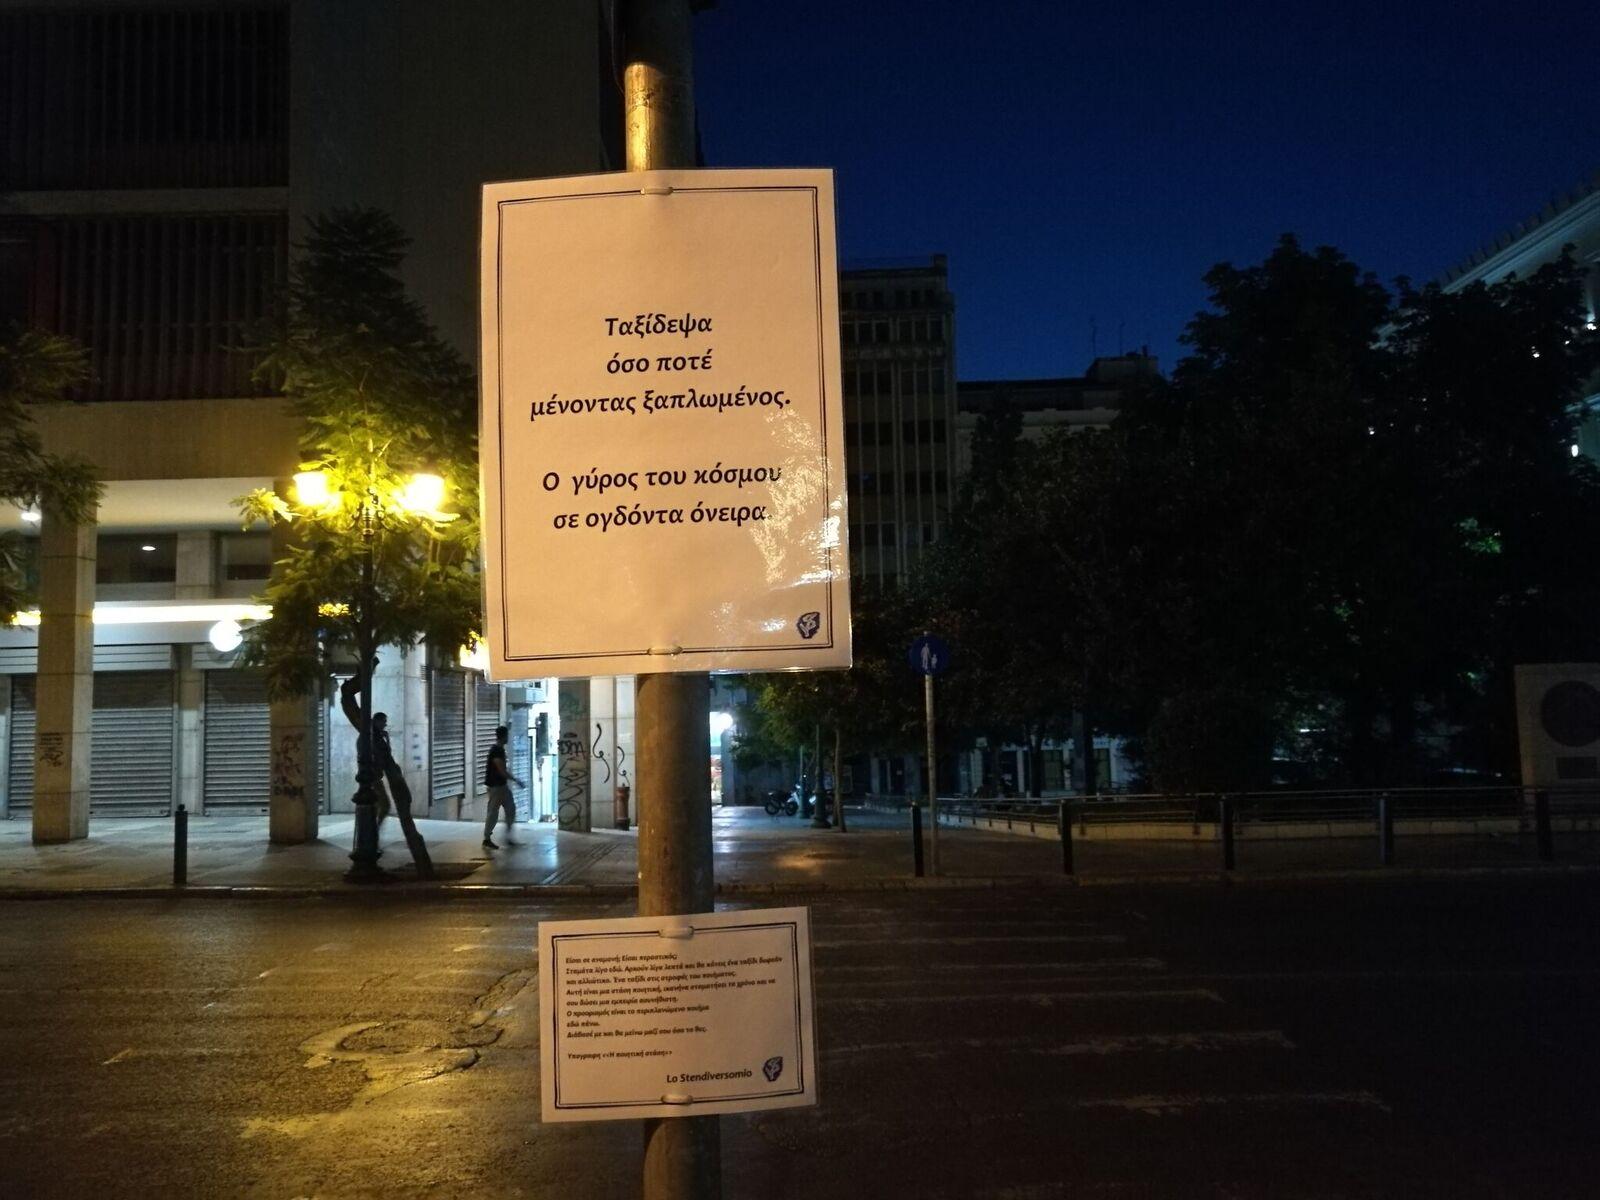 Piazze notturne